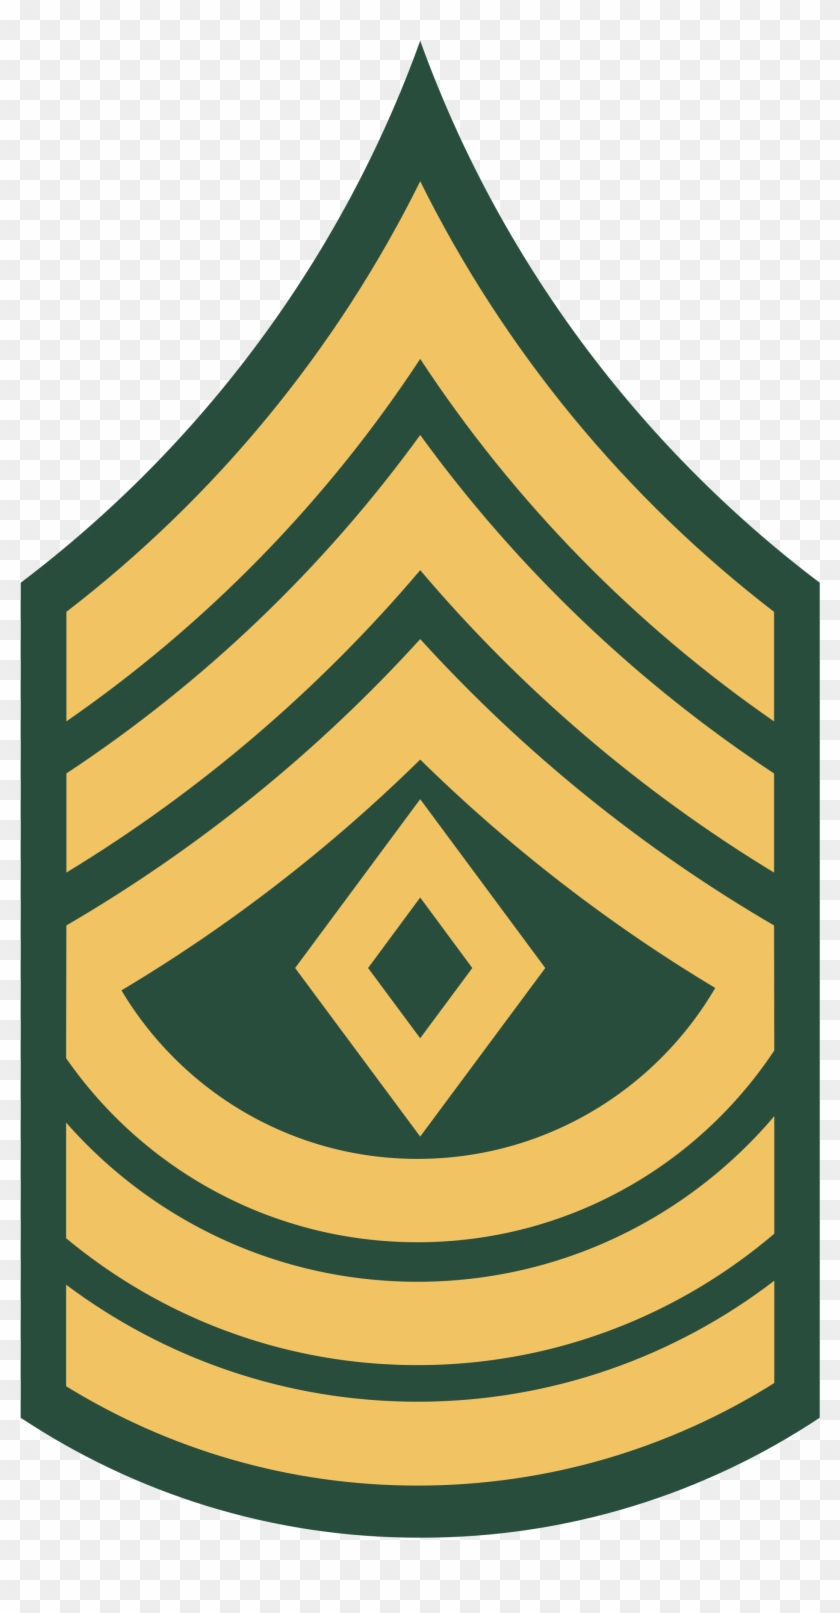 Us Army Logo Clip Art - Army First Sergeant Rank #39544